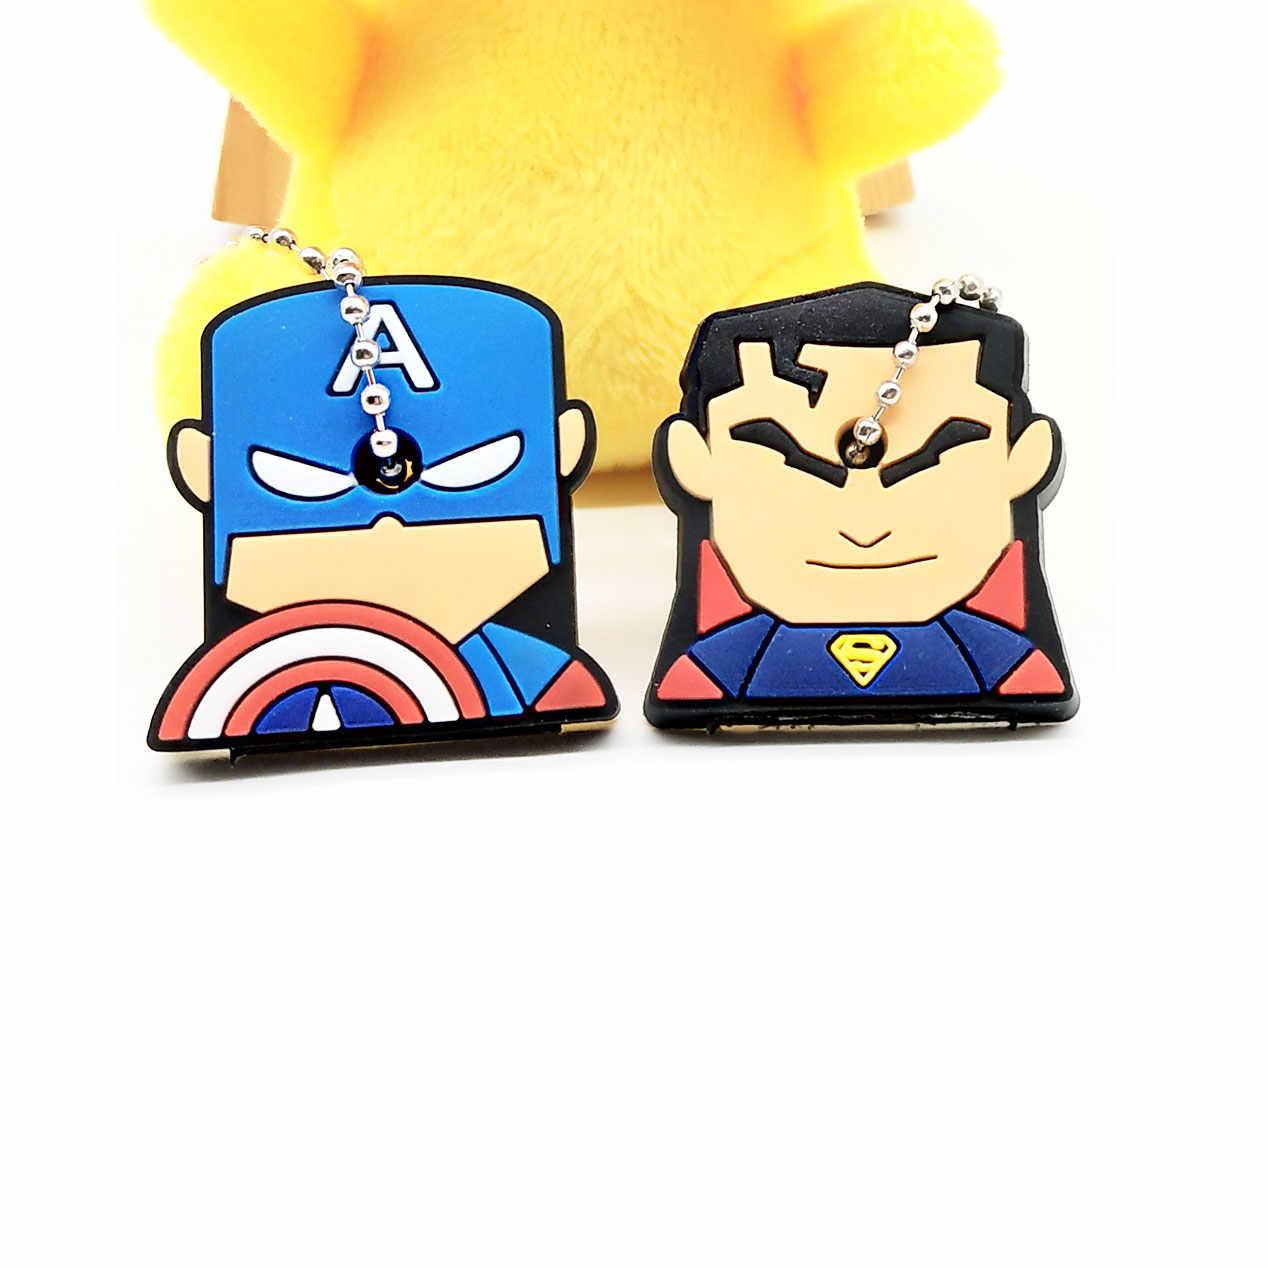 2 PCS Dos Desenhos Animados Anime Tampa Chave Bonito mickey ponto Urso Chaveiro Silicone super hero porte clef cap minne chave proteger